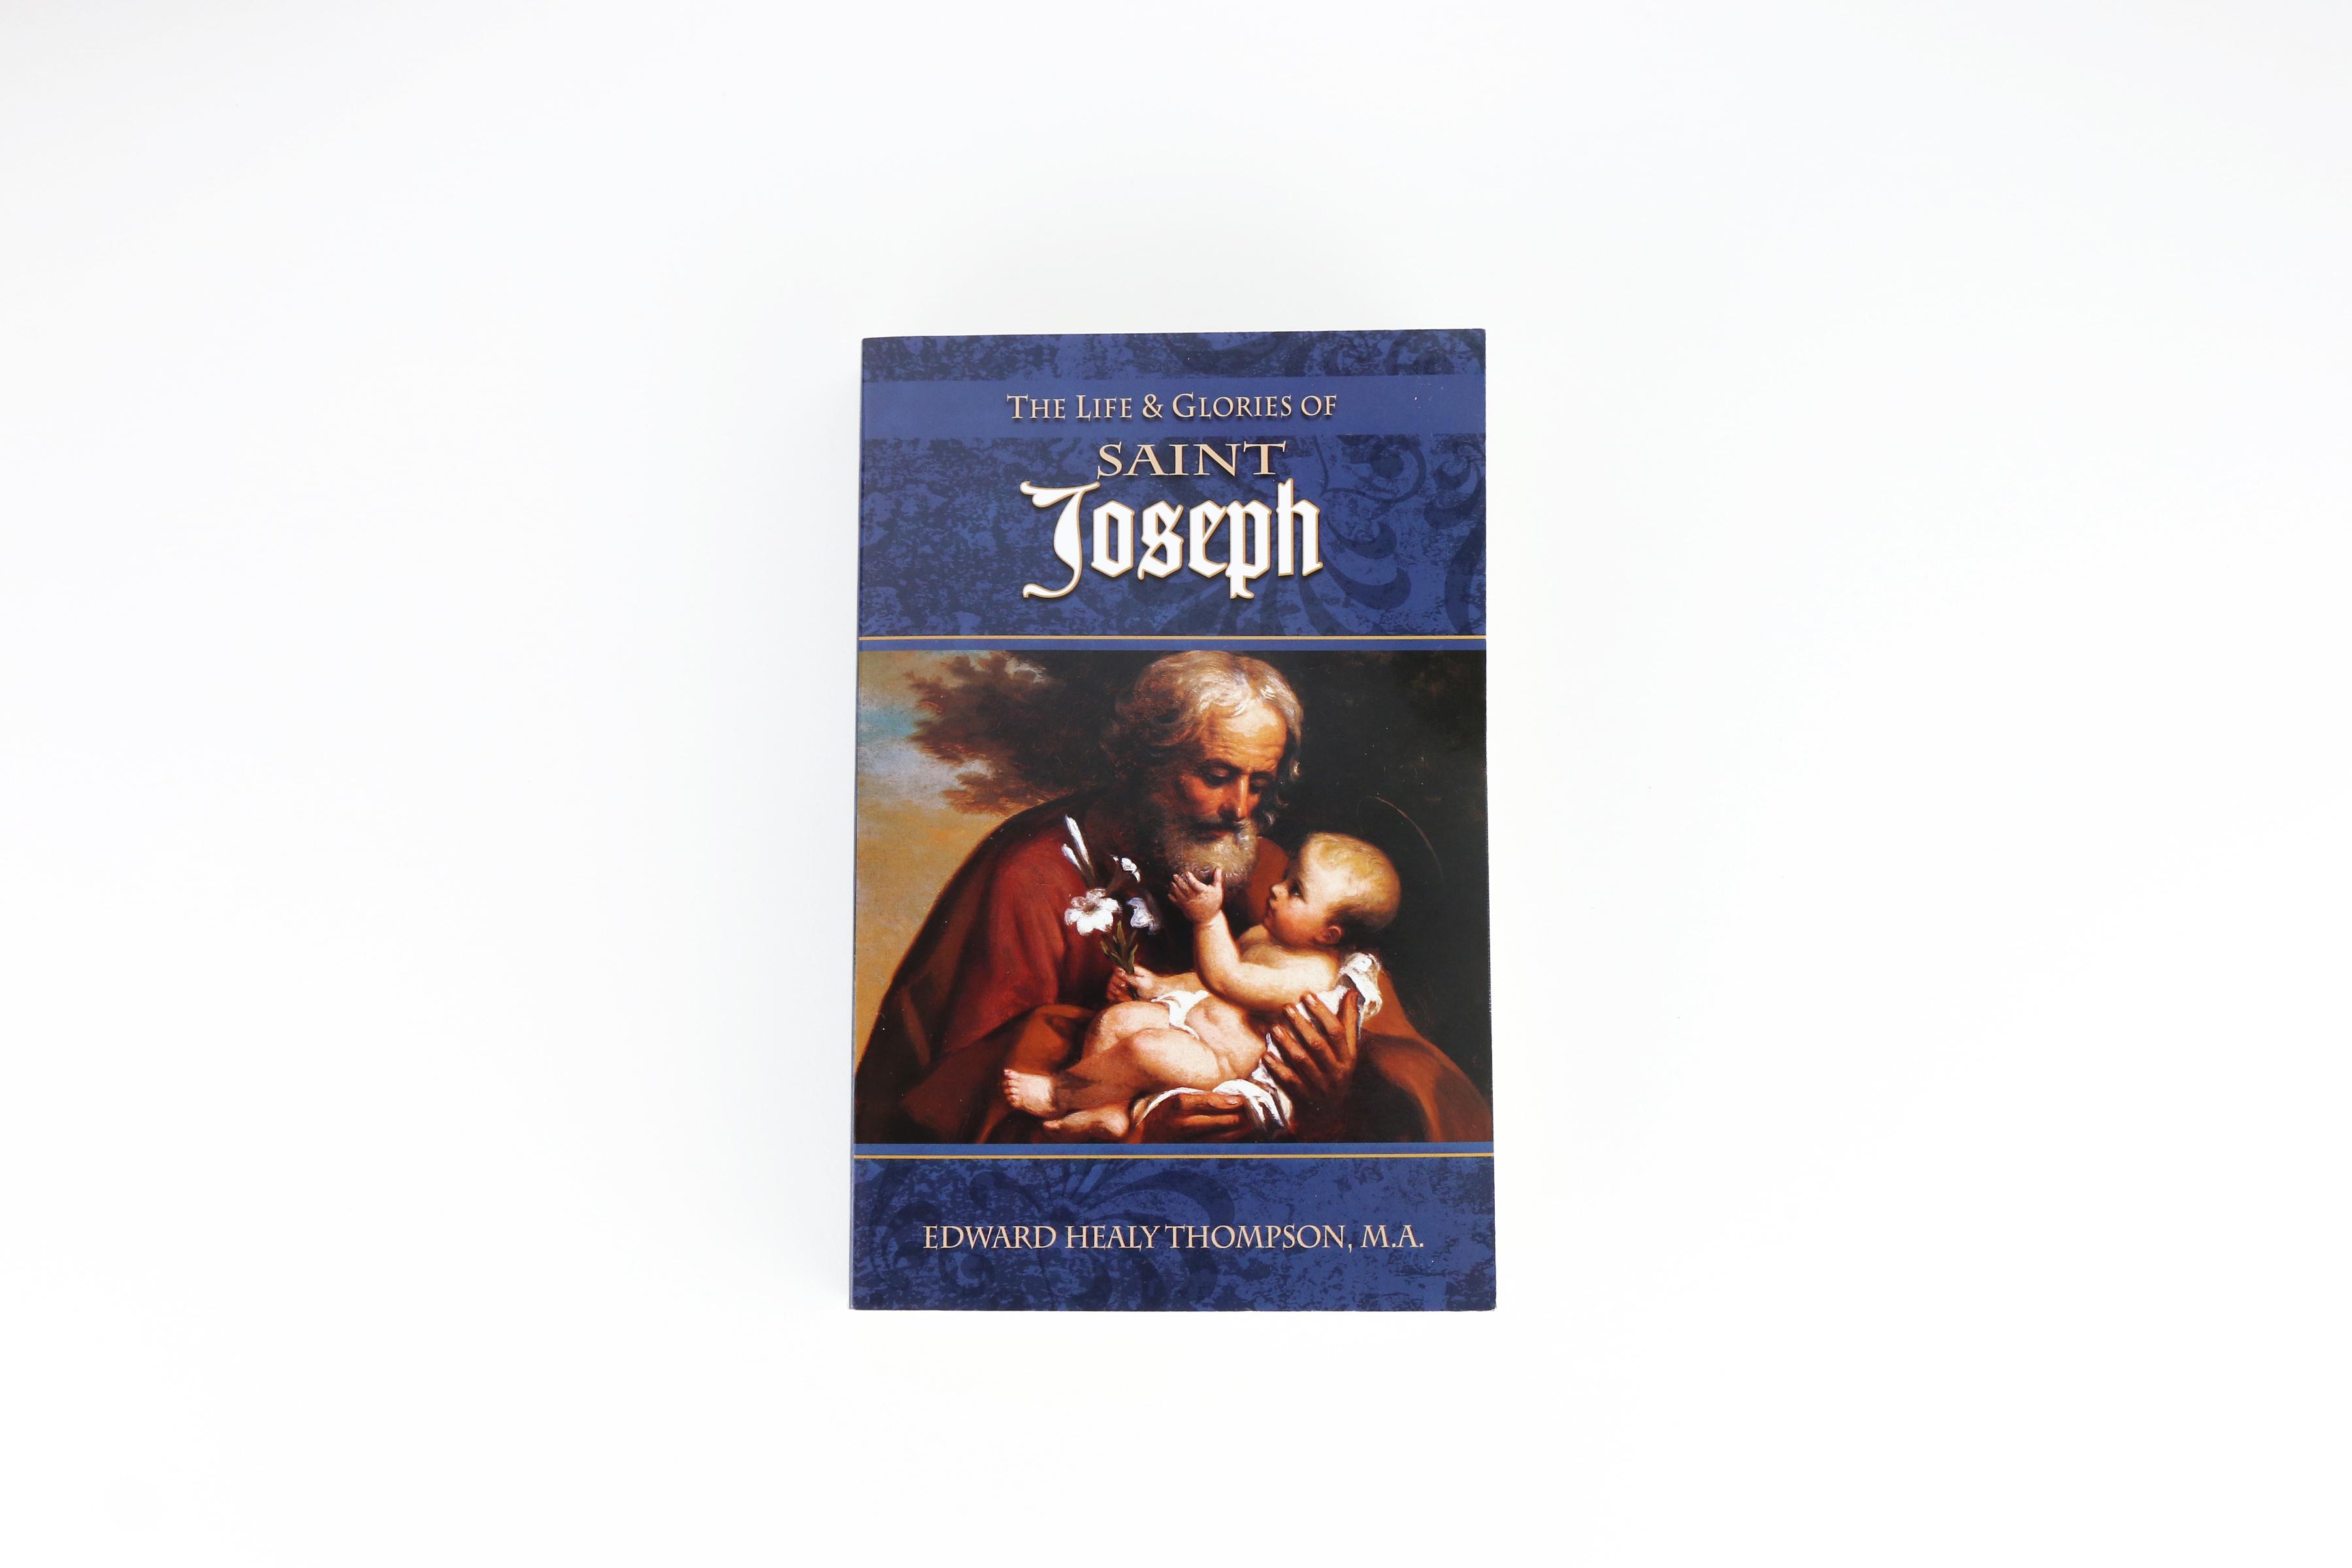 The Life and Glories of Saint Joseph